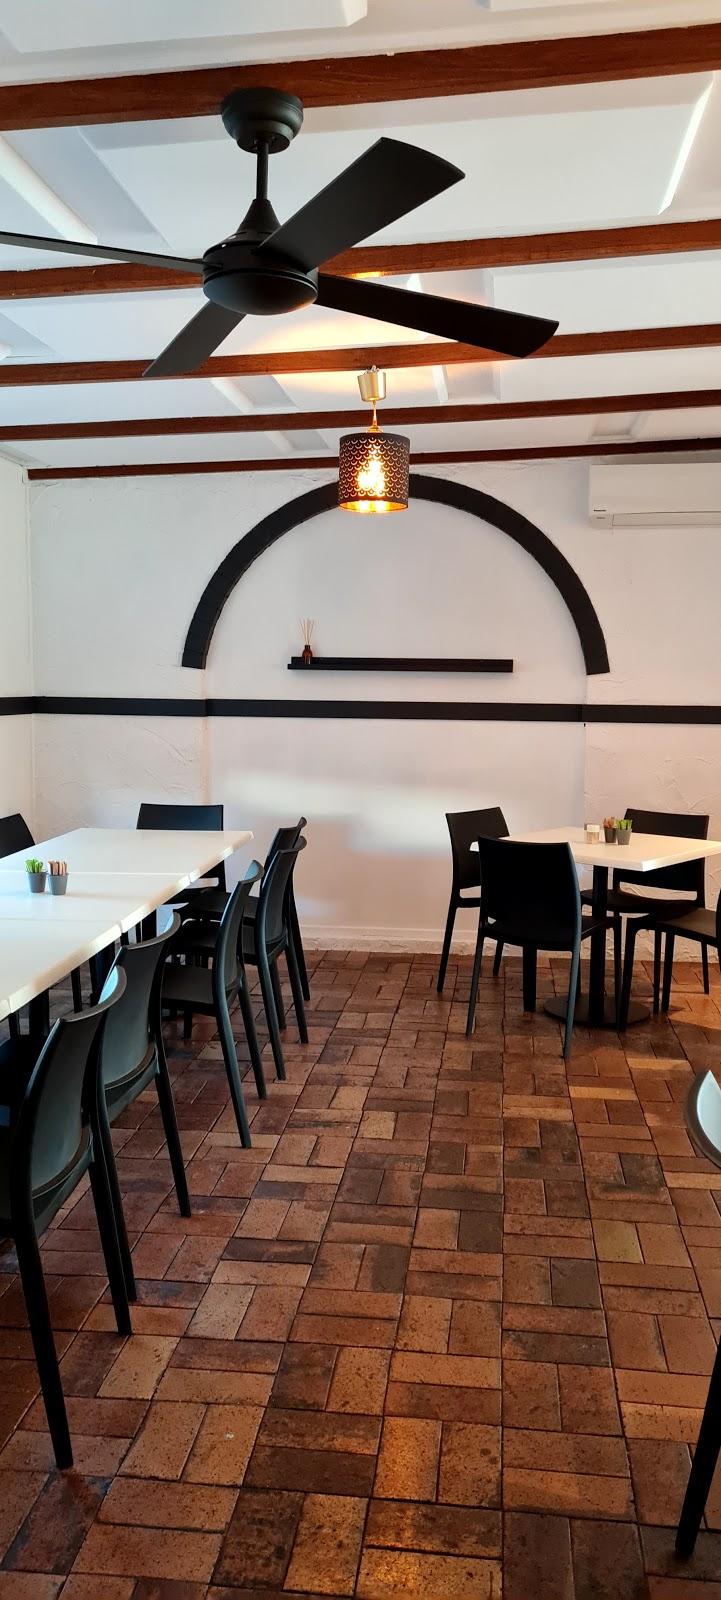 Gather 4390   restaurant   126a Marshall St, Goondiwindi QLD 4390, Australia   0438183528 OR +61 438 183 528